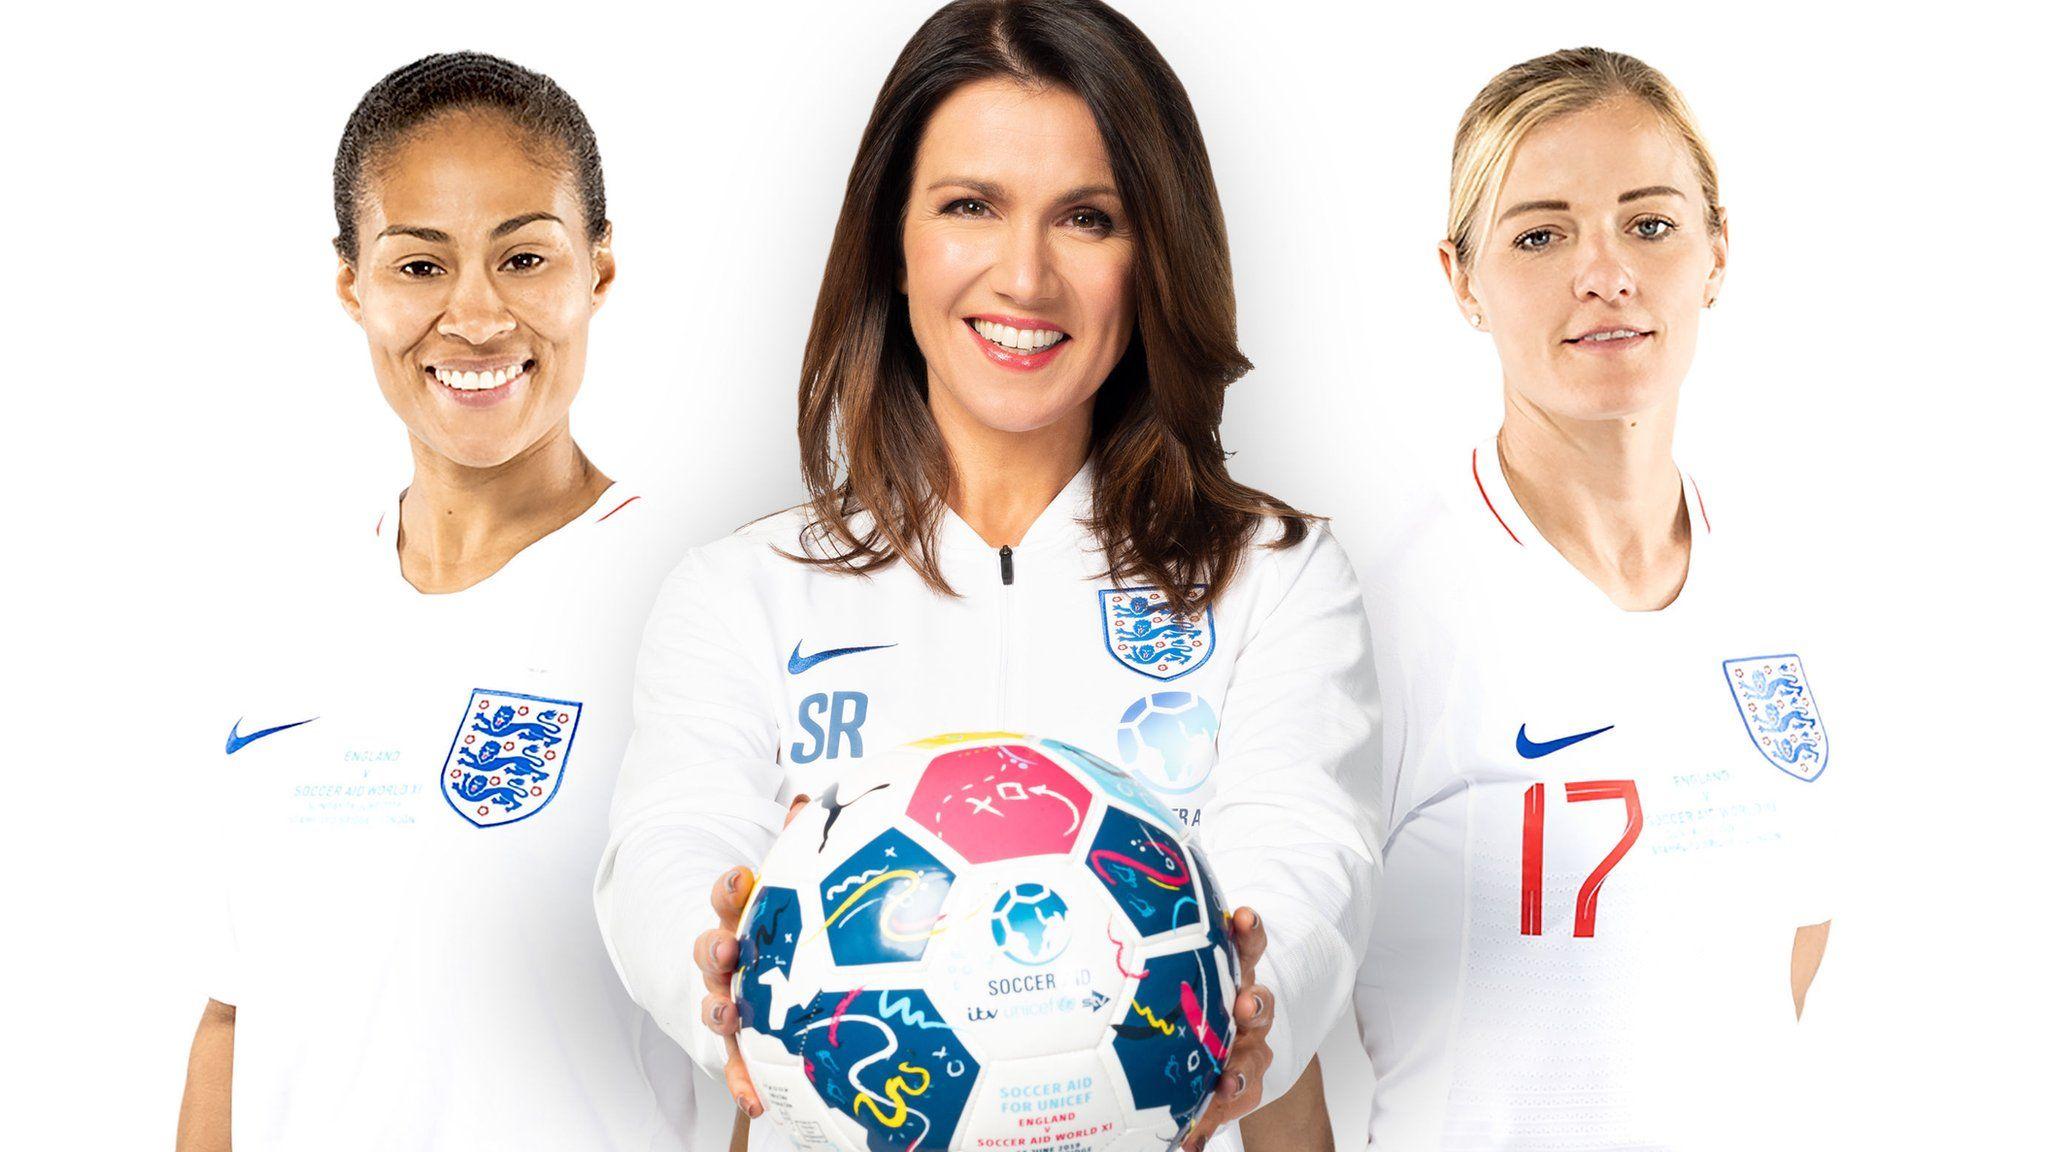 Pin By Brighton Rose Spearritt On Soccer Aid In 2020 Soccer Aid Soccer Bbc Sport